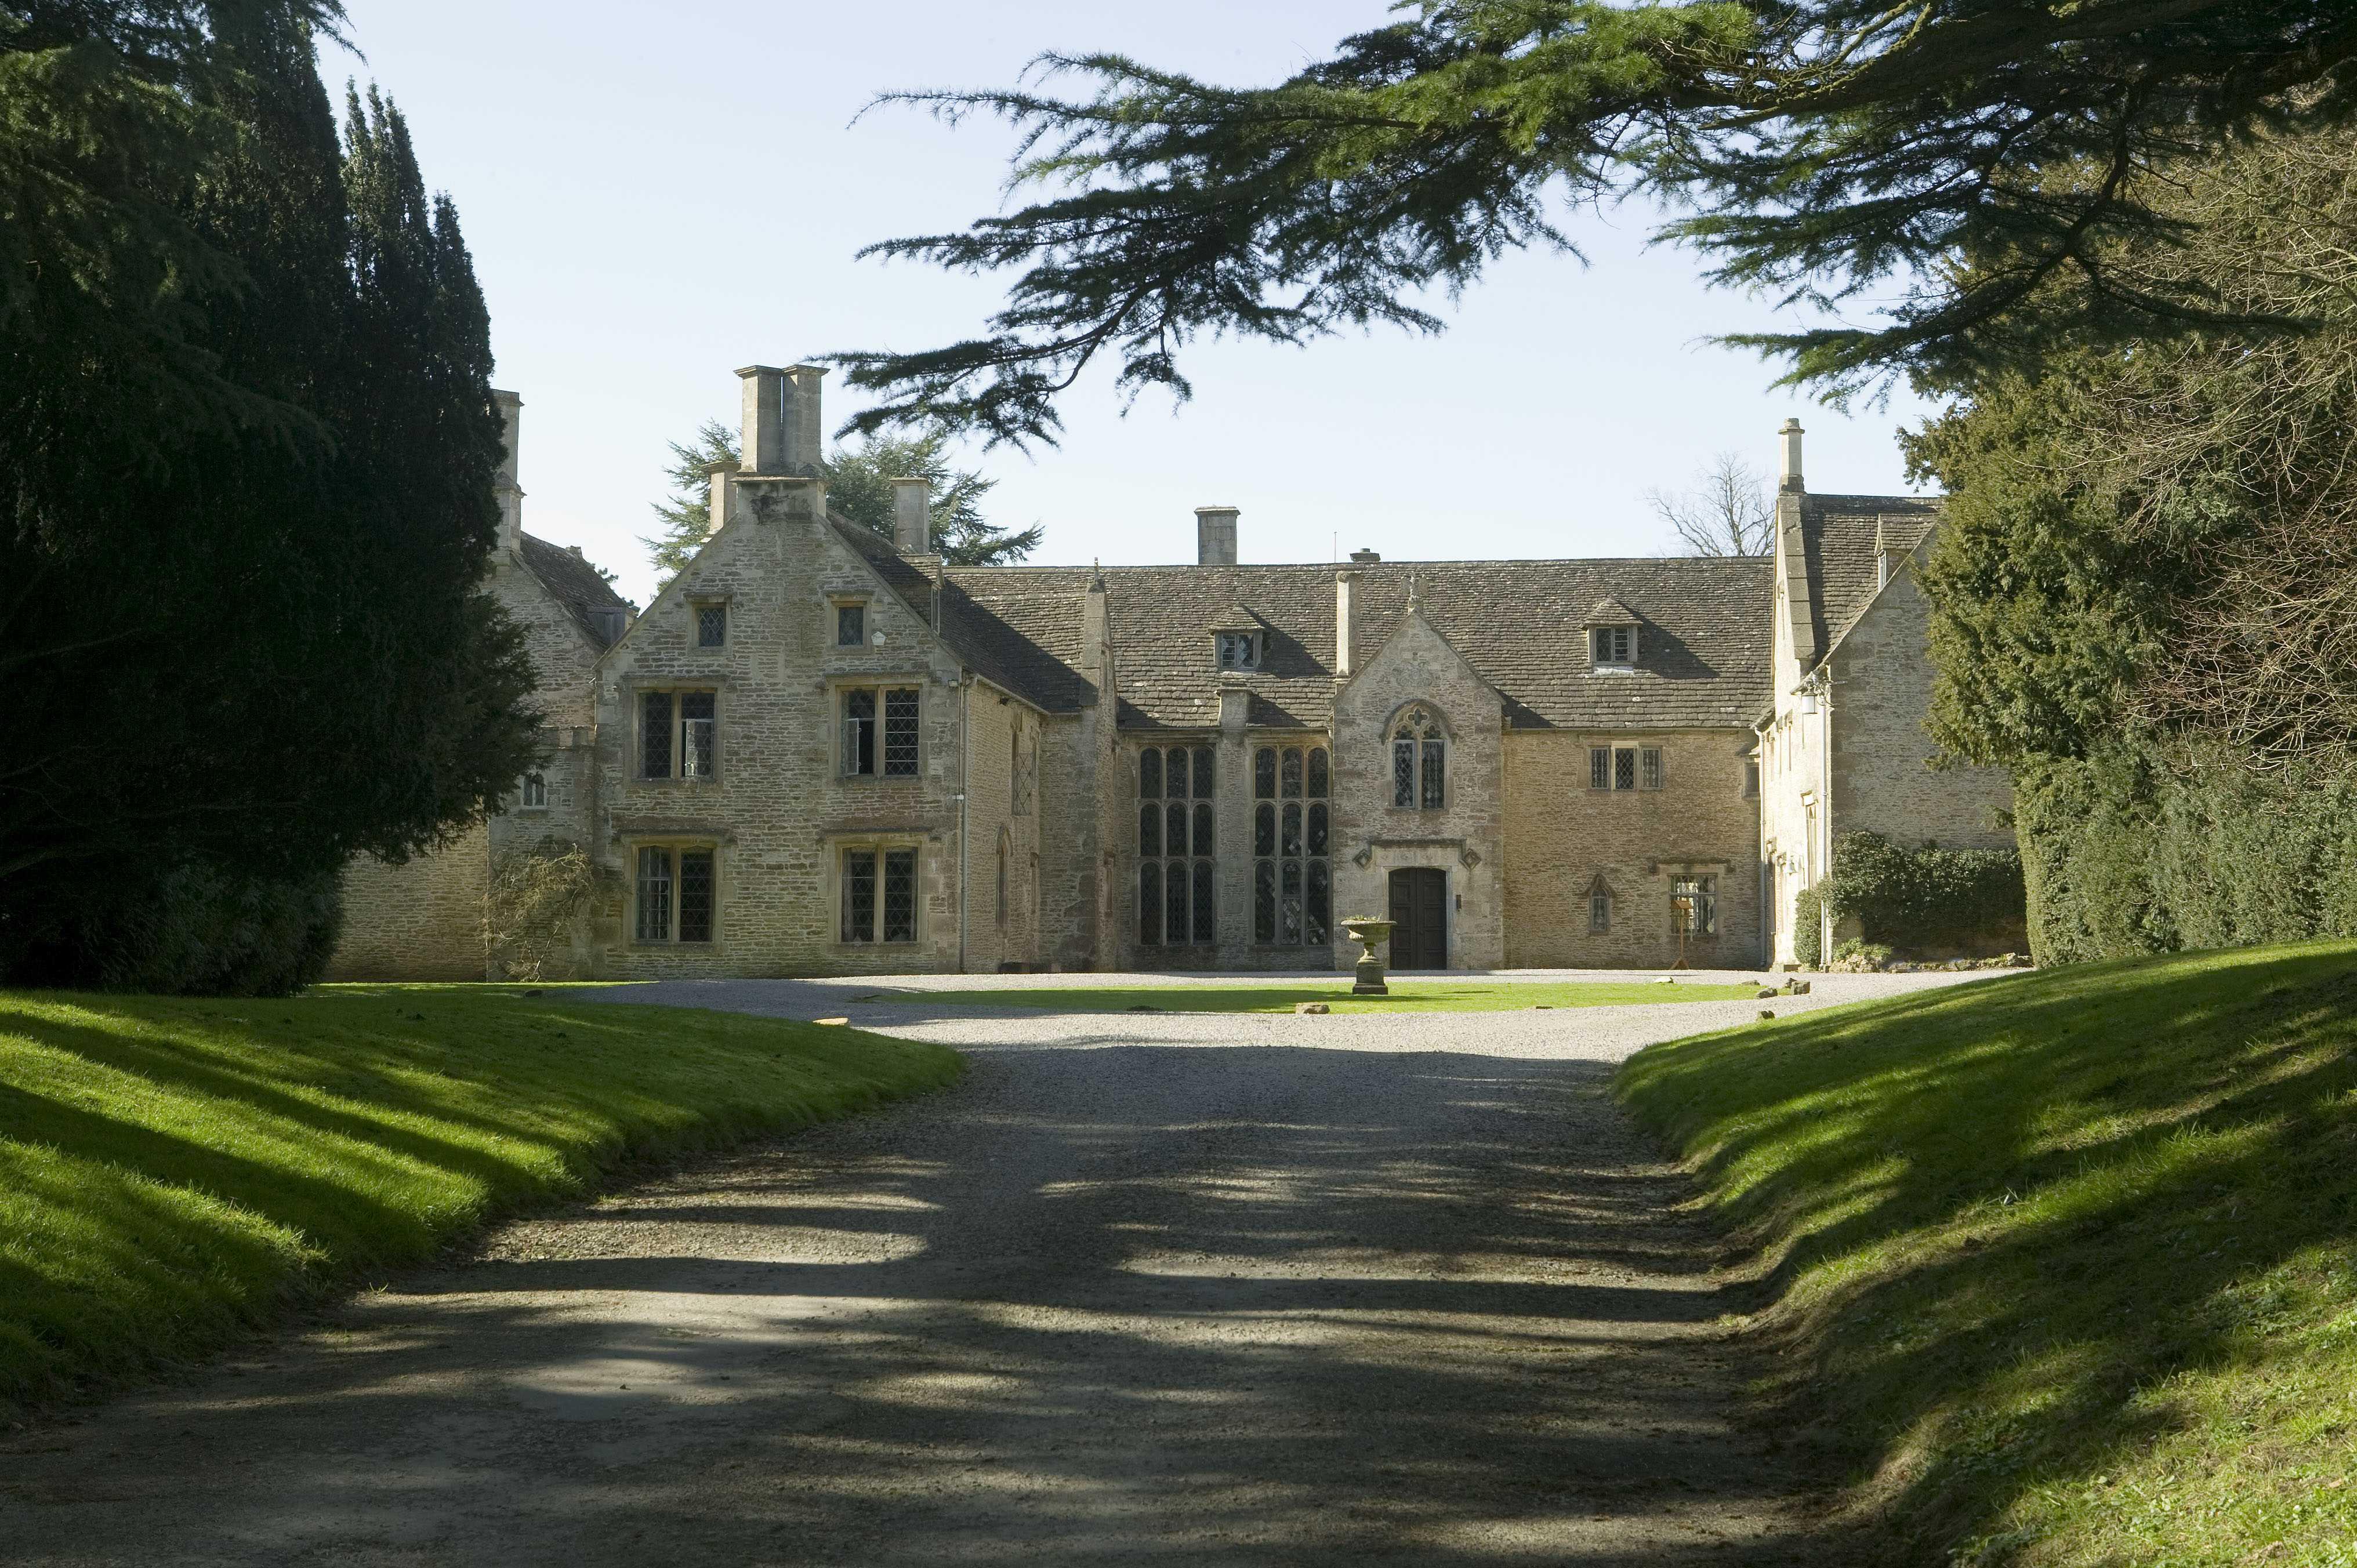 Chavenage House, Gloucestershire, England